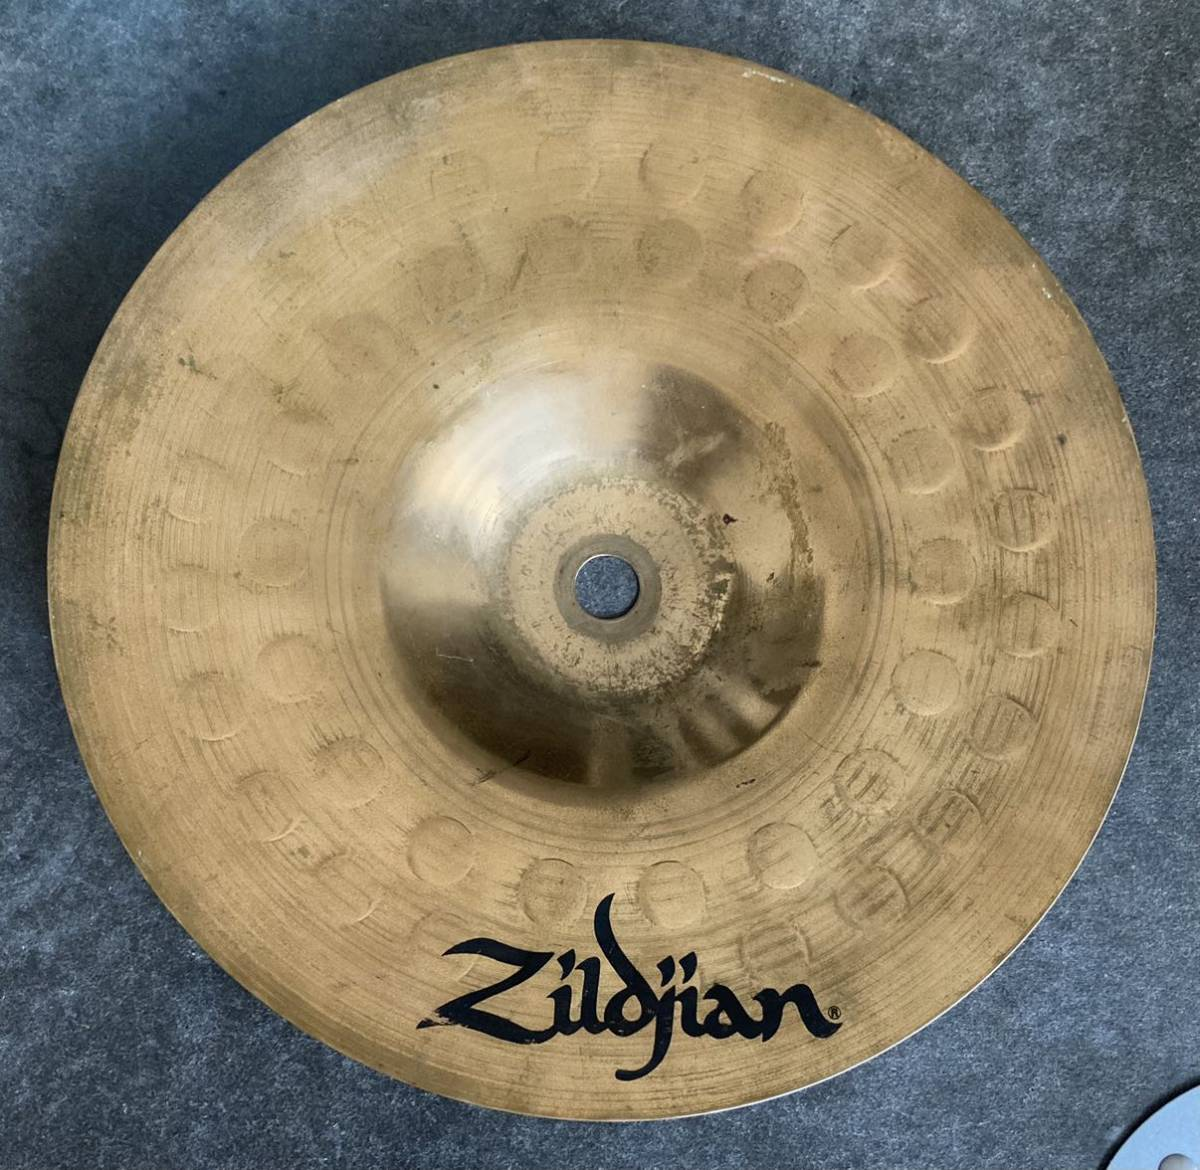 Zildjian ジルジャン ZBT PLUS 20 ハイハット ジャンク品 送料無料_画像2